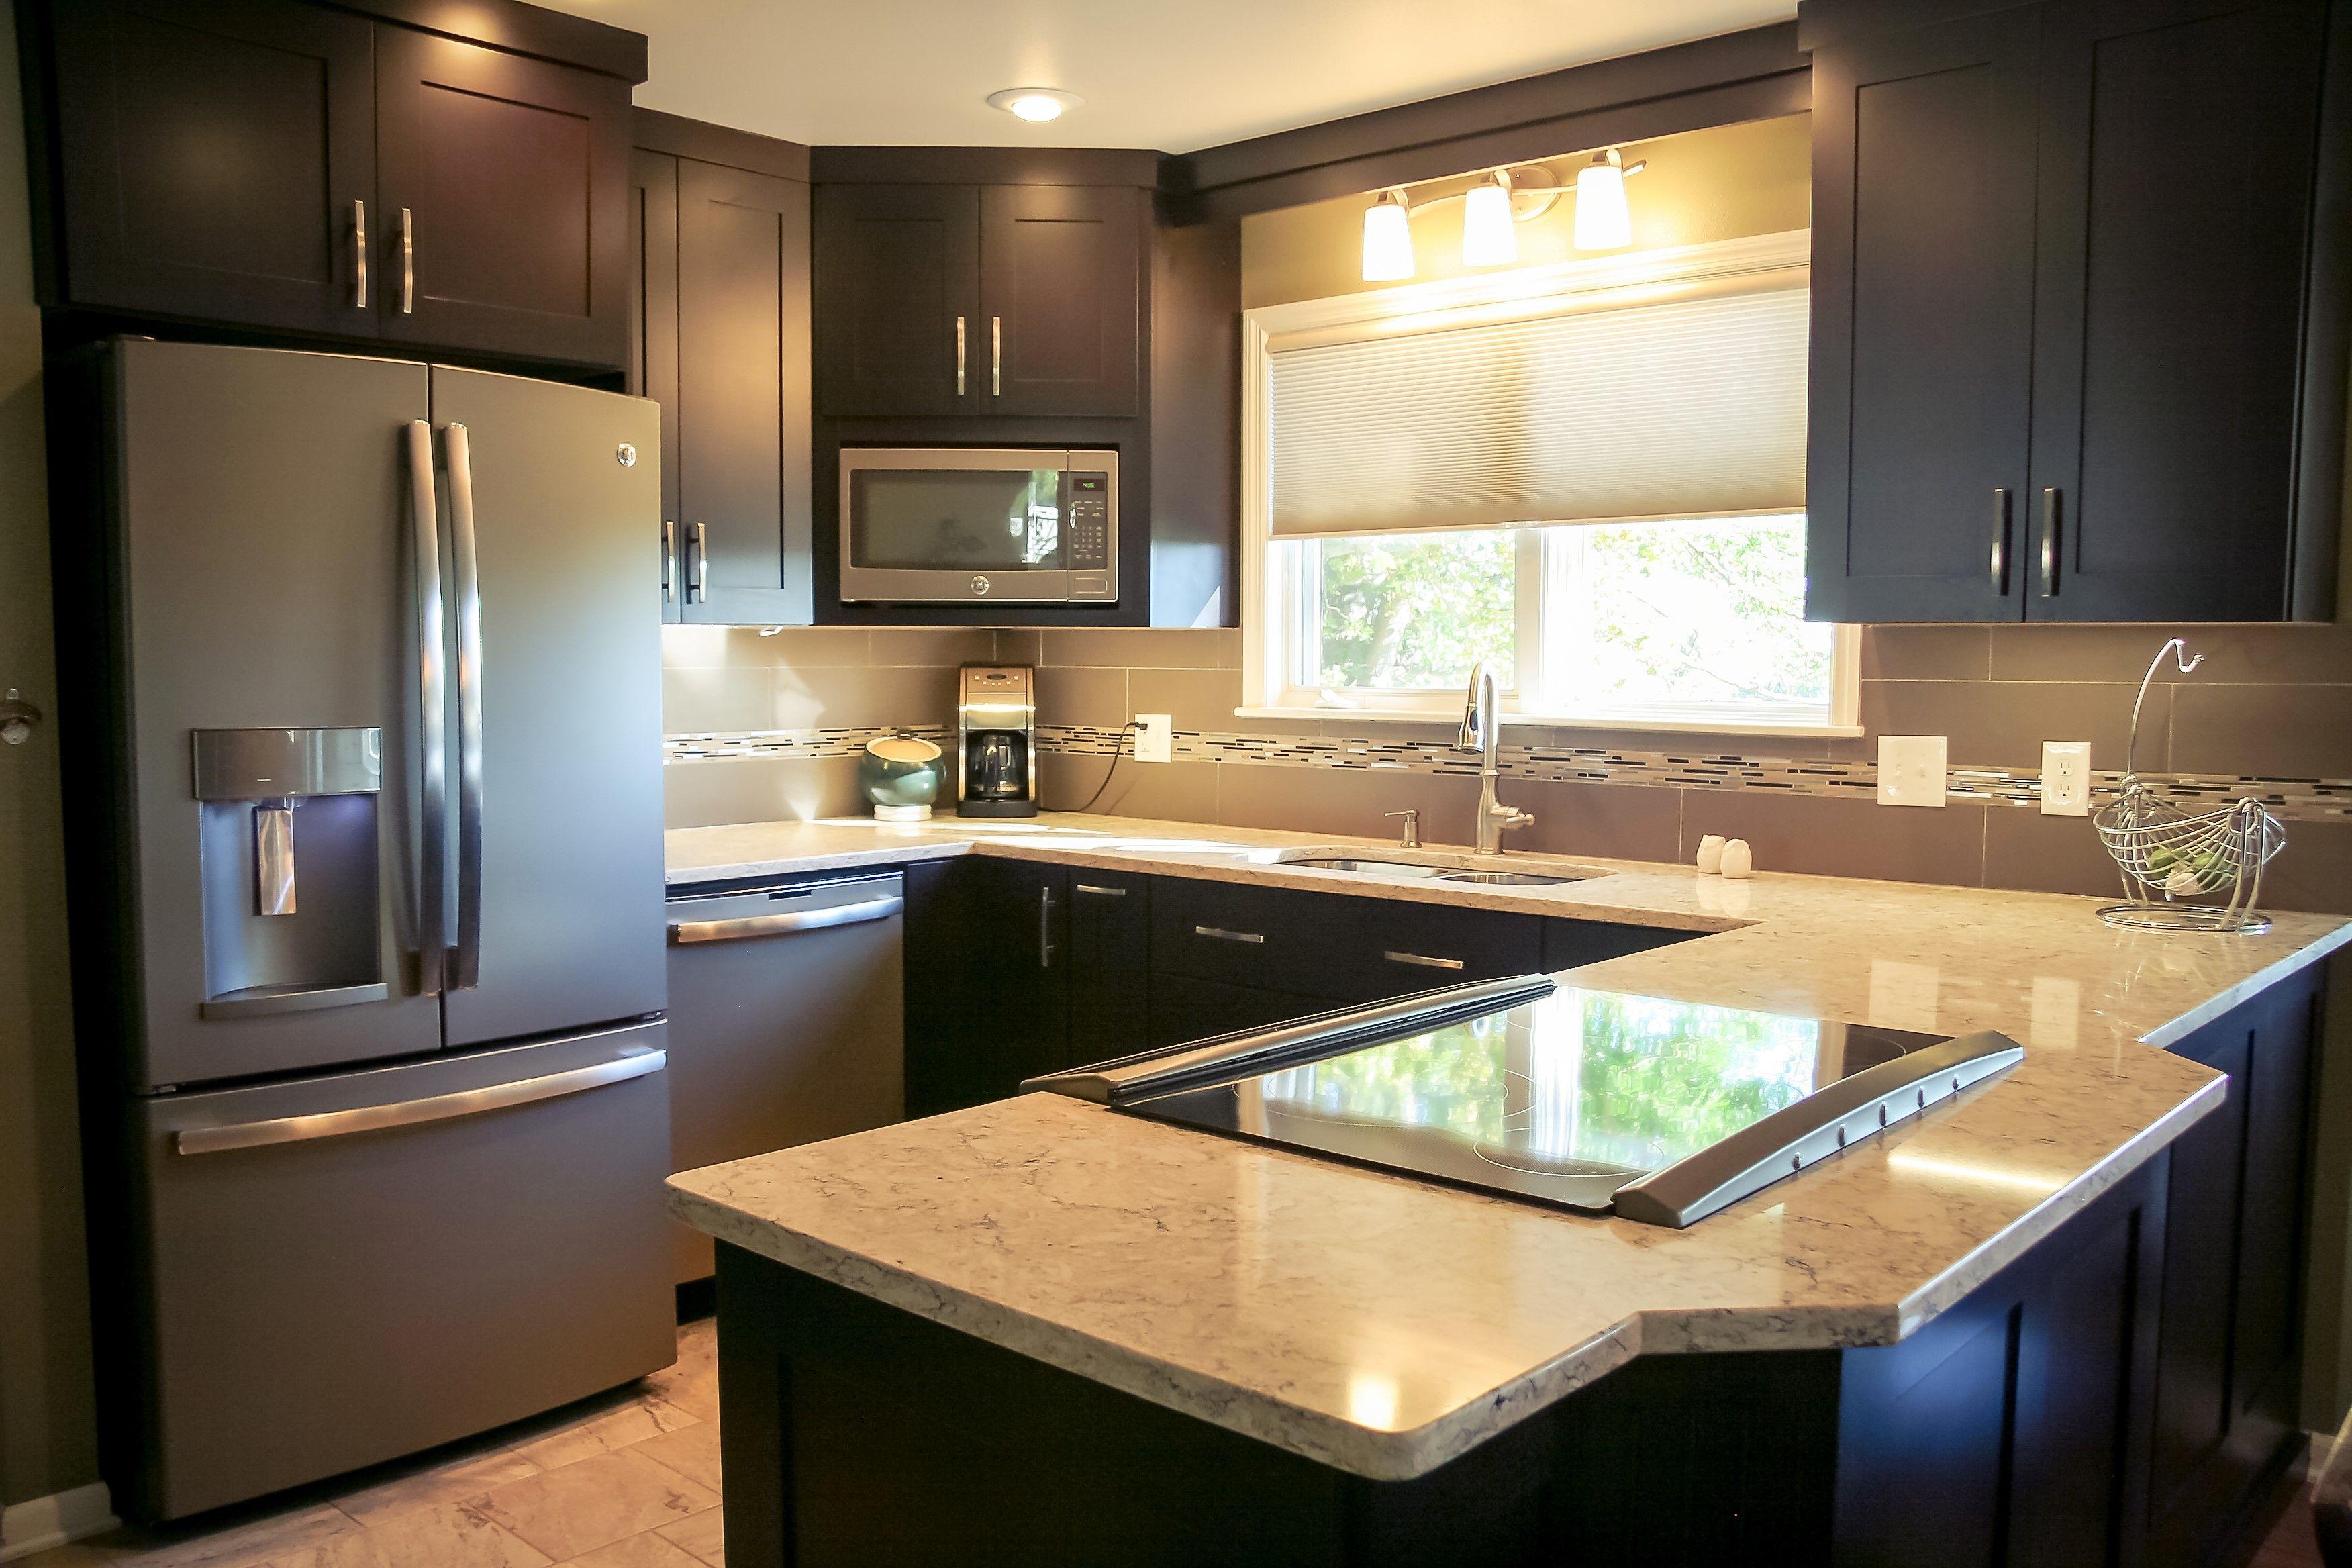 Secrets Of A Functional Kitchen Functional Kitchen Kitchen Kitchen And Bath Design